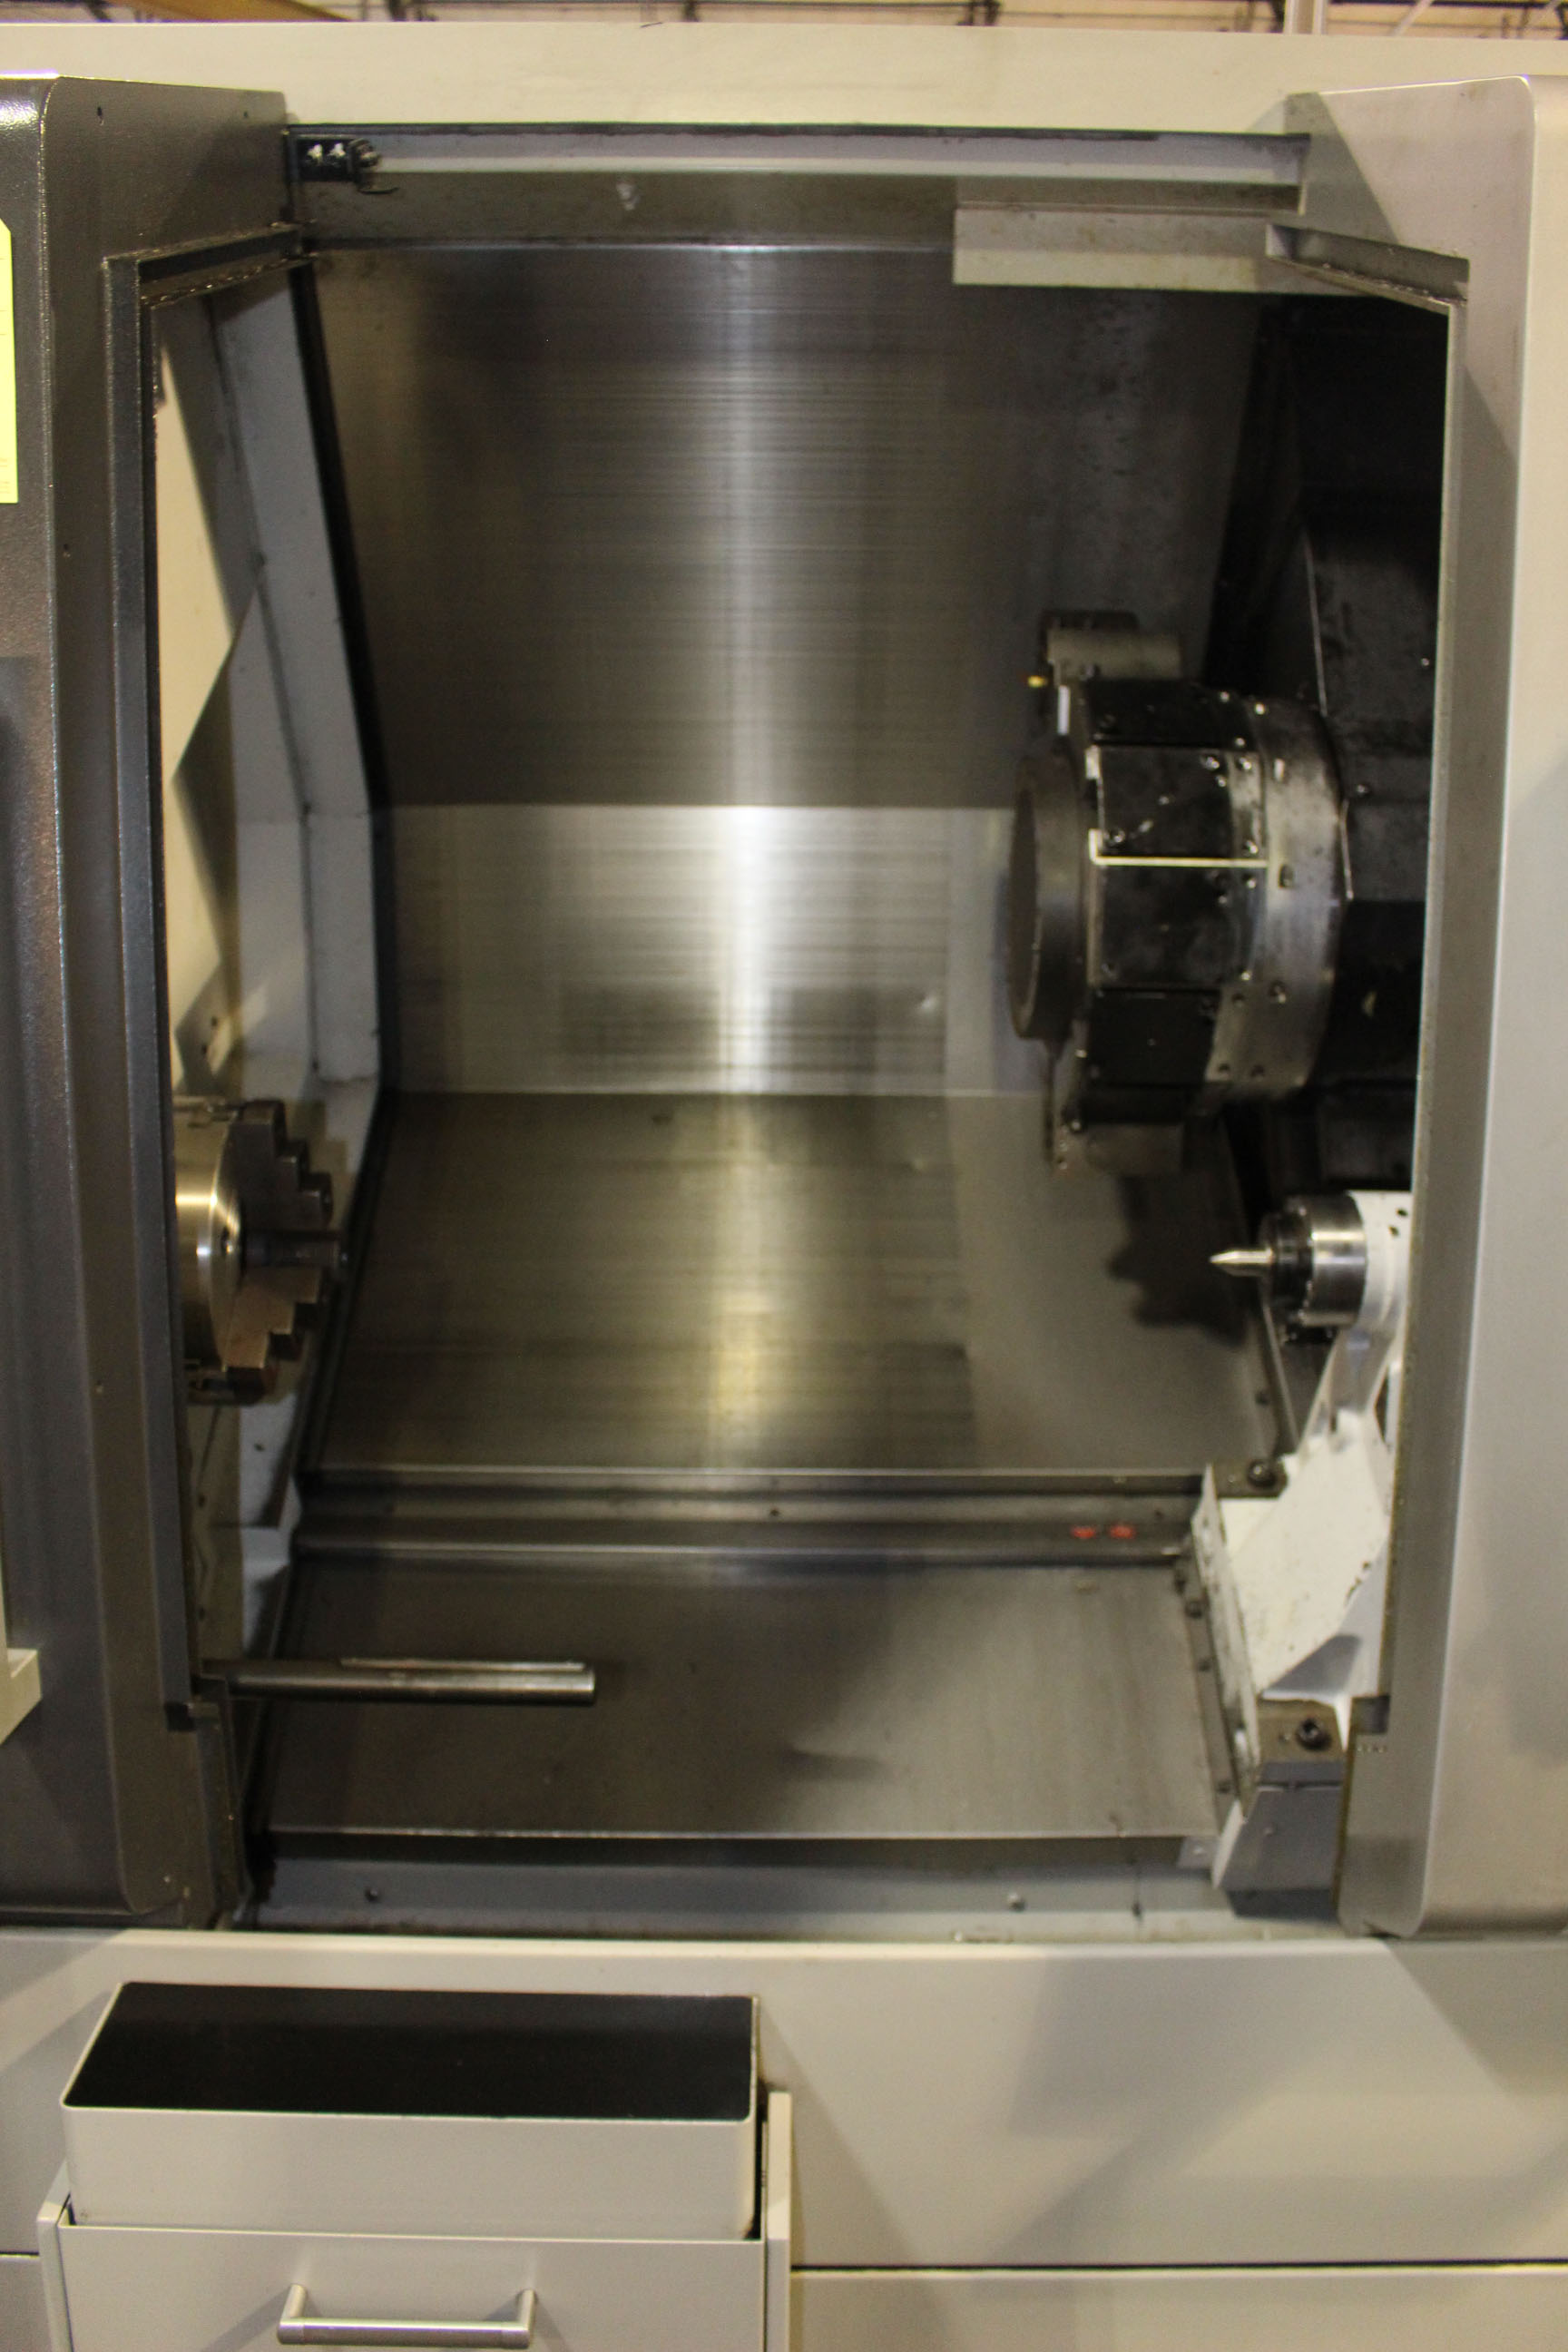 Lot 27 - CNC LATHE, MORI SEIKI MULTI-AXIS MDL. NLX2500Y/700, new 6/2012, Mori Seiki 720BM CNC control, 36.